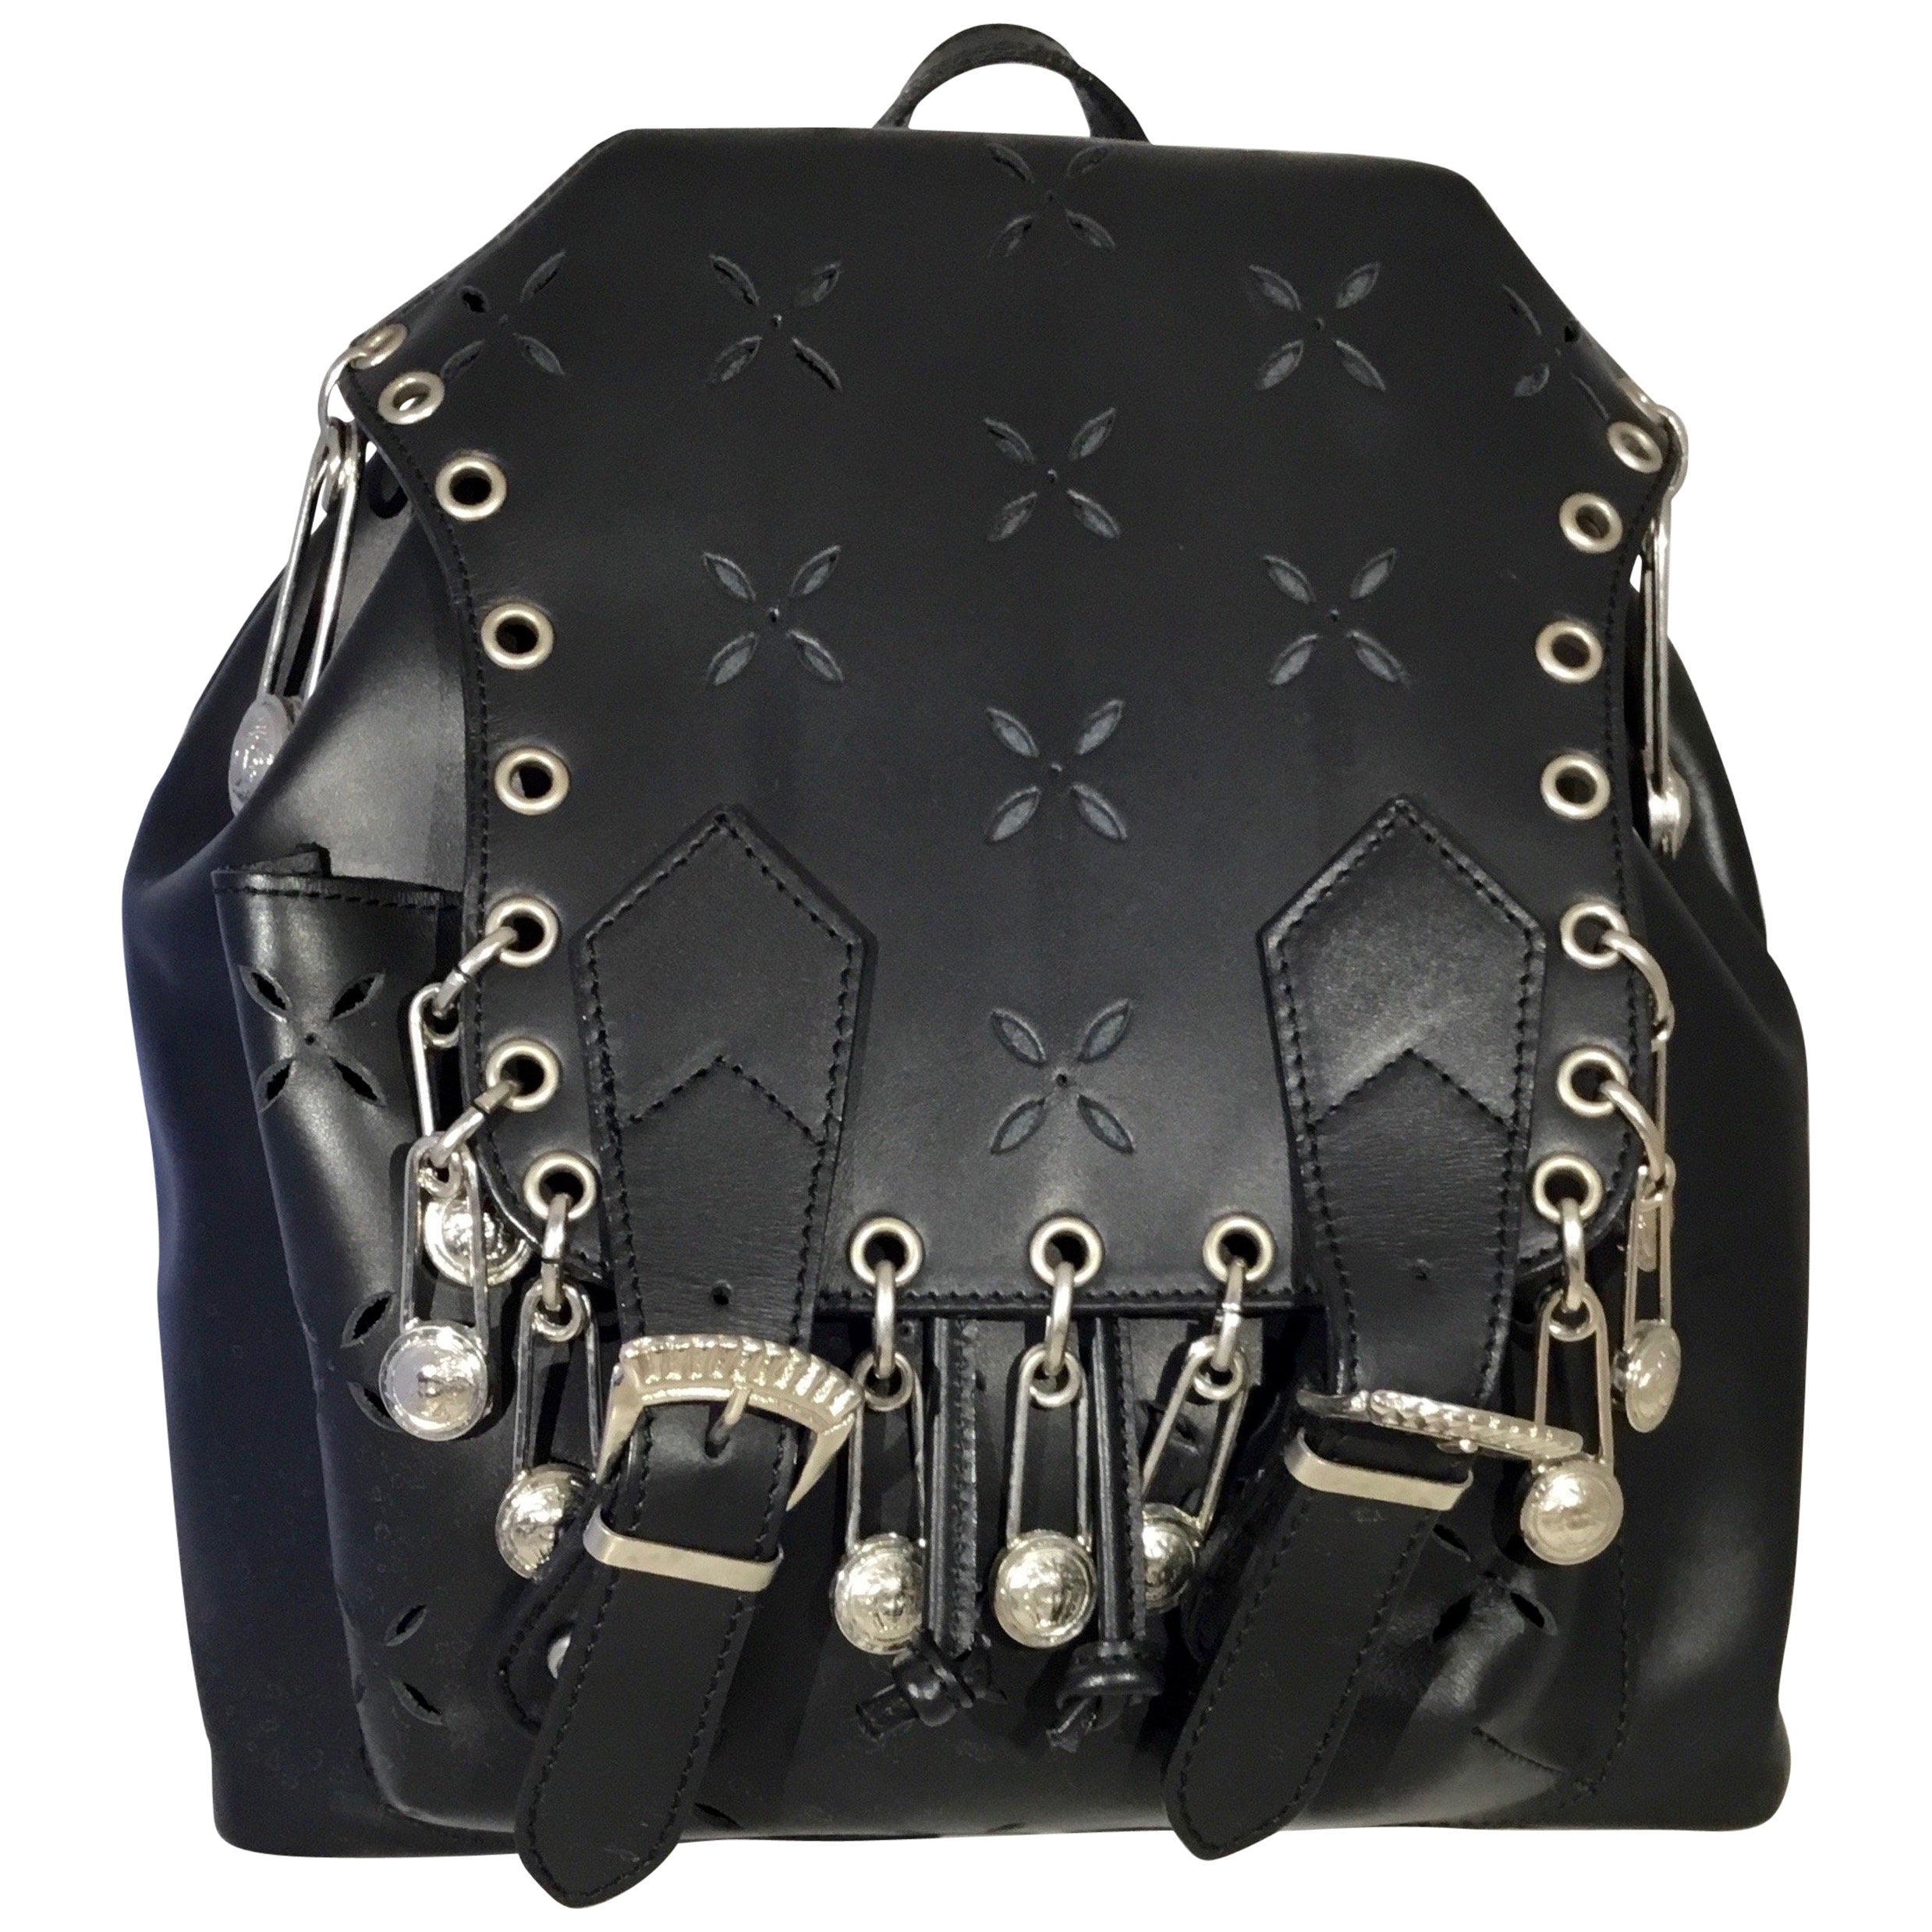 6865fa2909 Gianni Versace 1994 Medusa Safety Pin Vintage Backpack Bag at 1stdibs